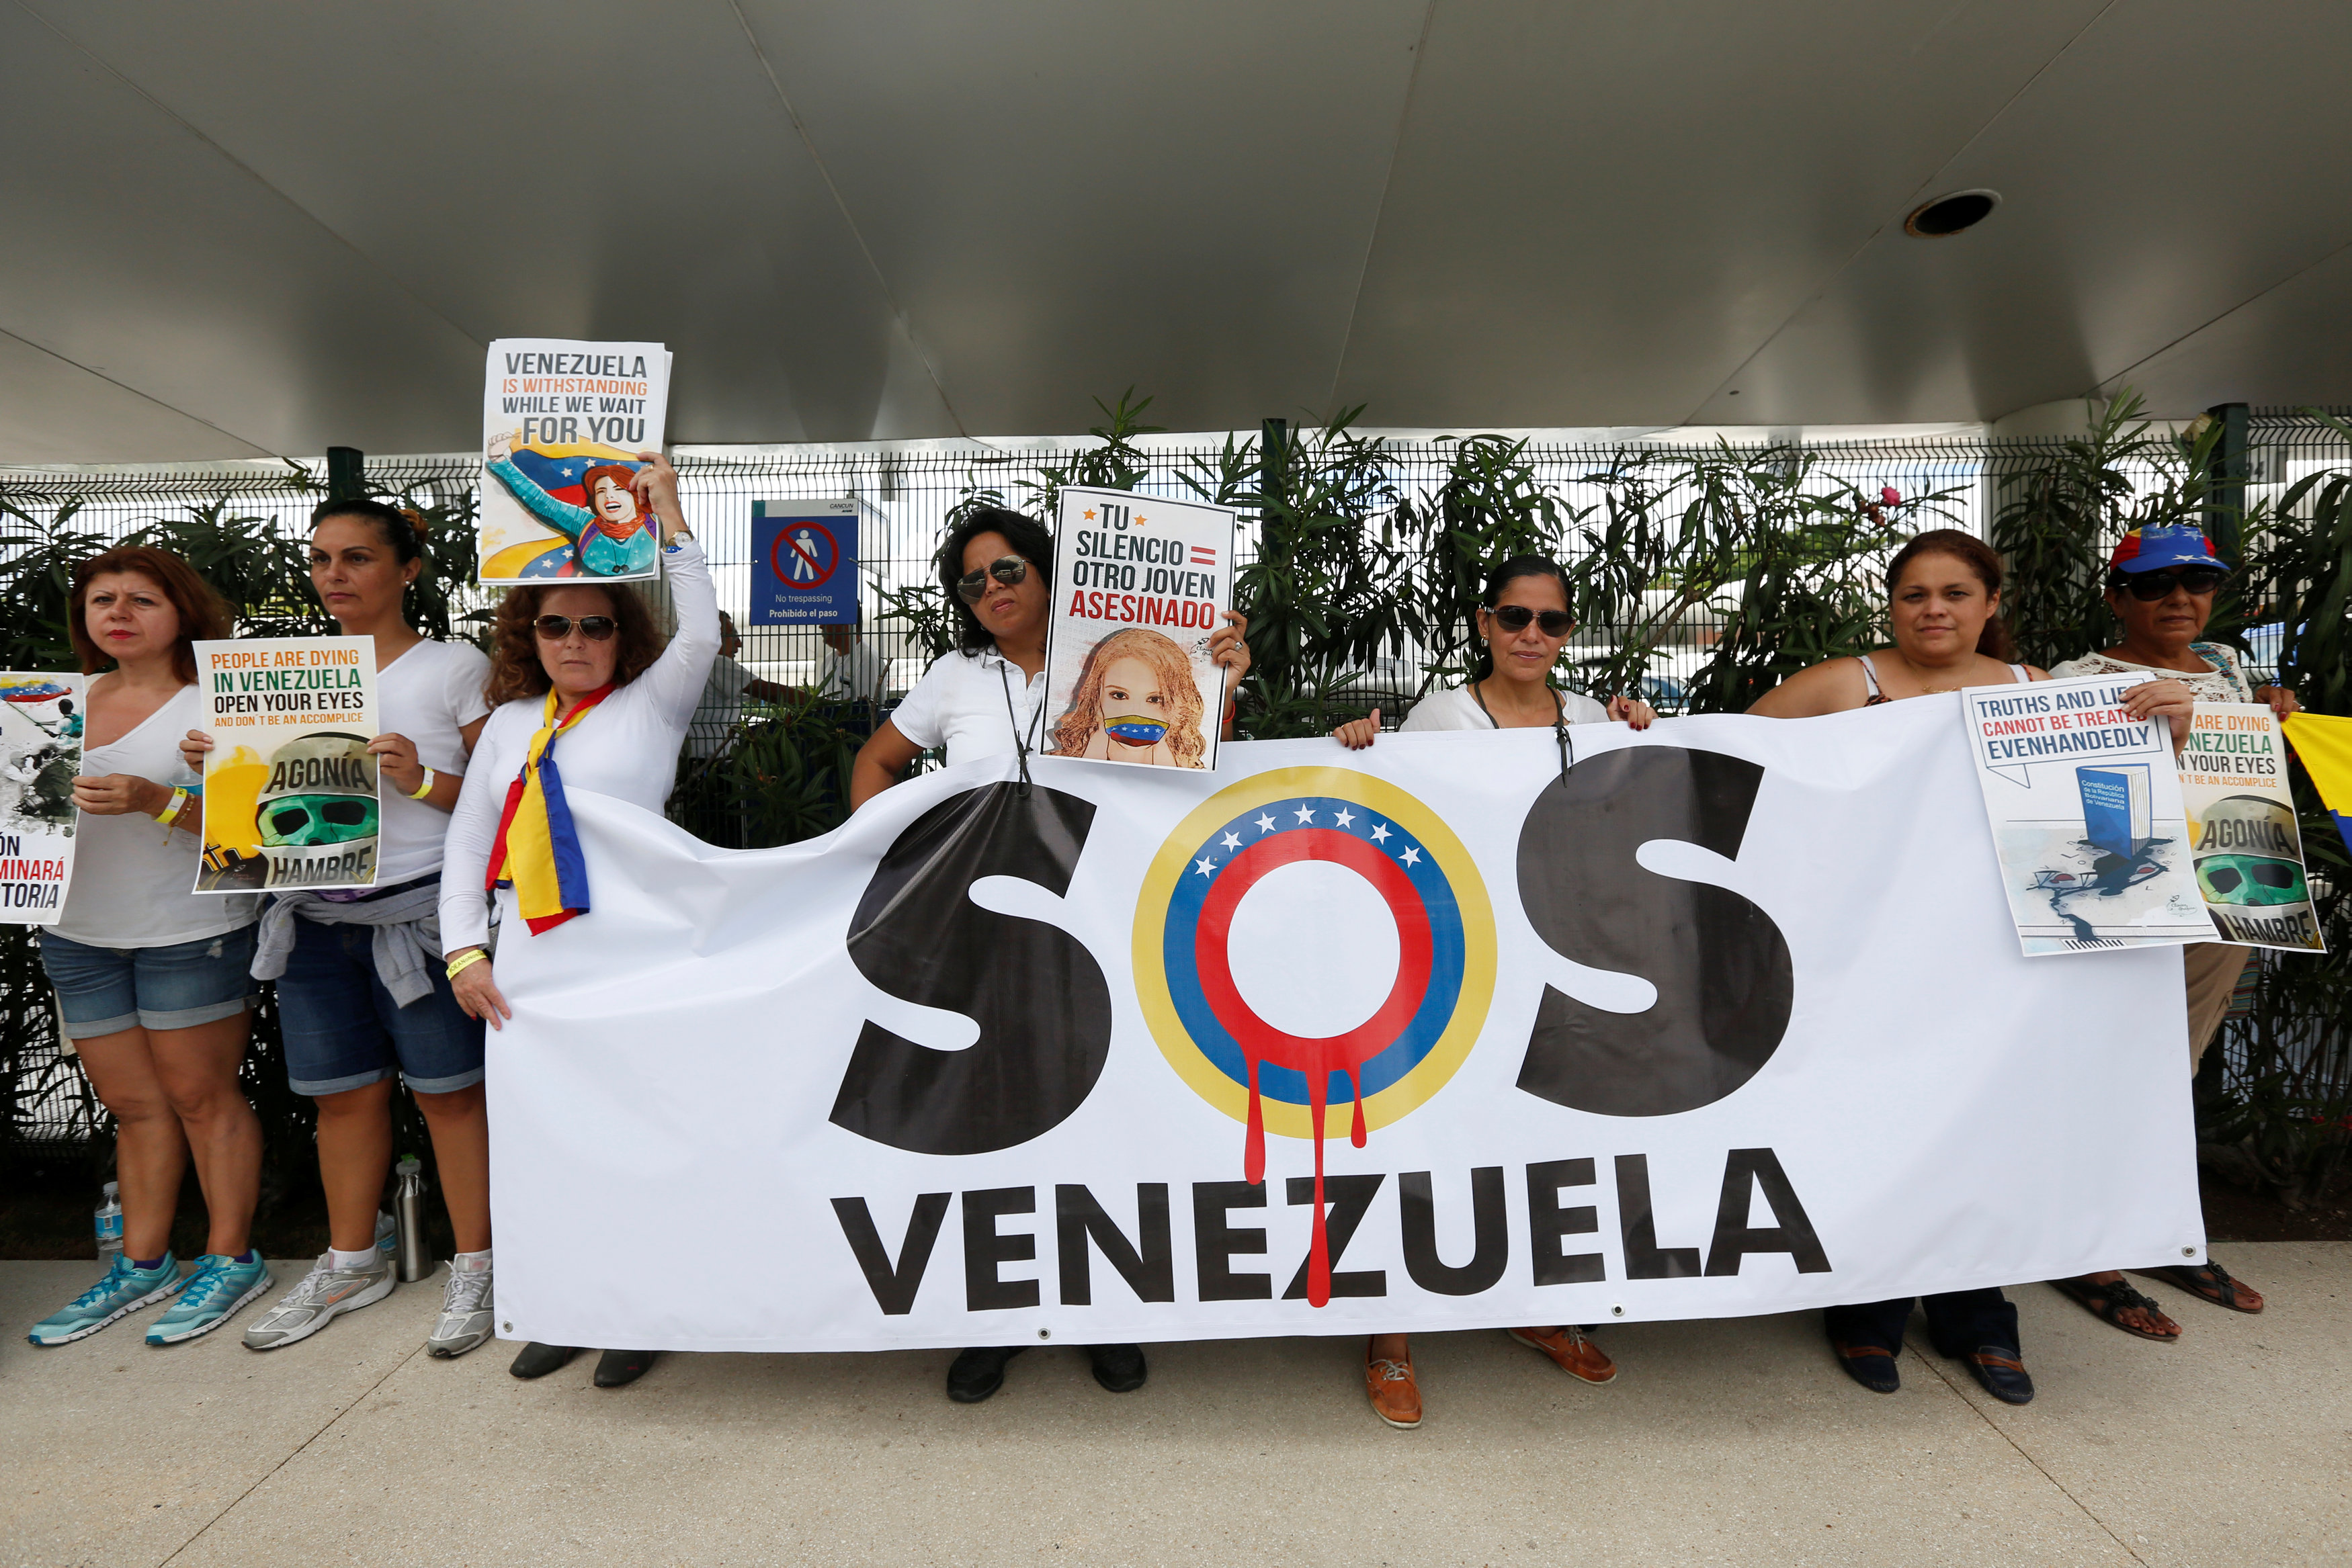 Venezolanos protestan contra el régimen chavista antes de la Asamblea General de la OEA en Cancún (Reuters)